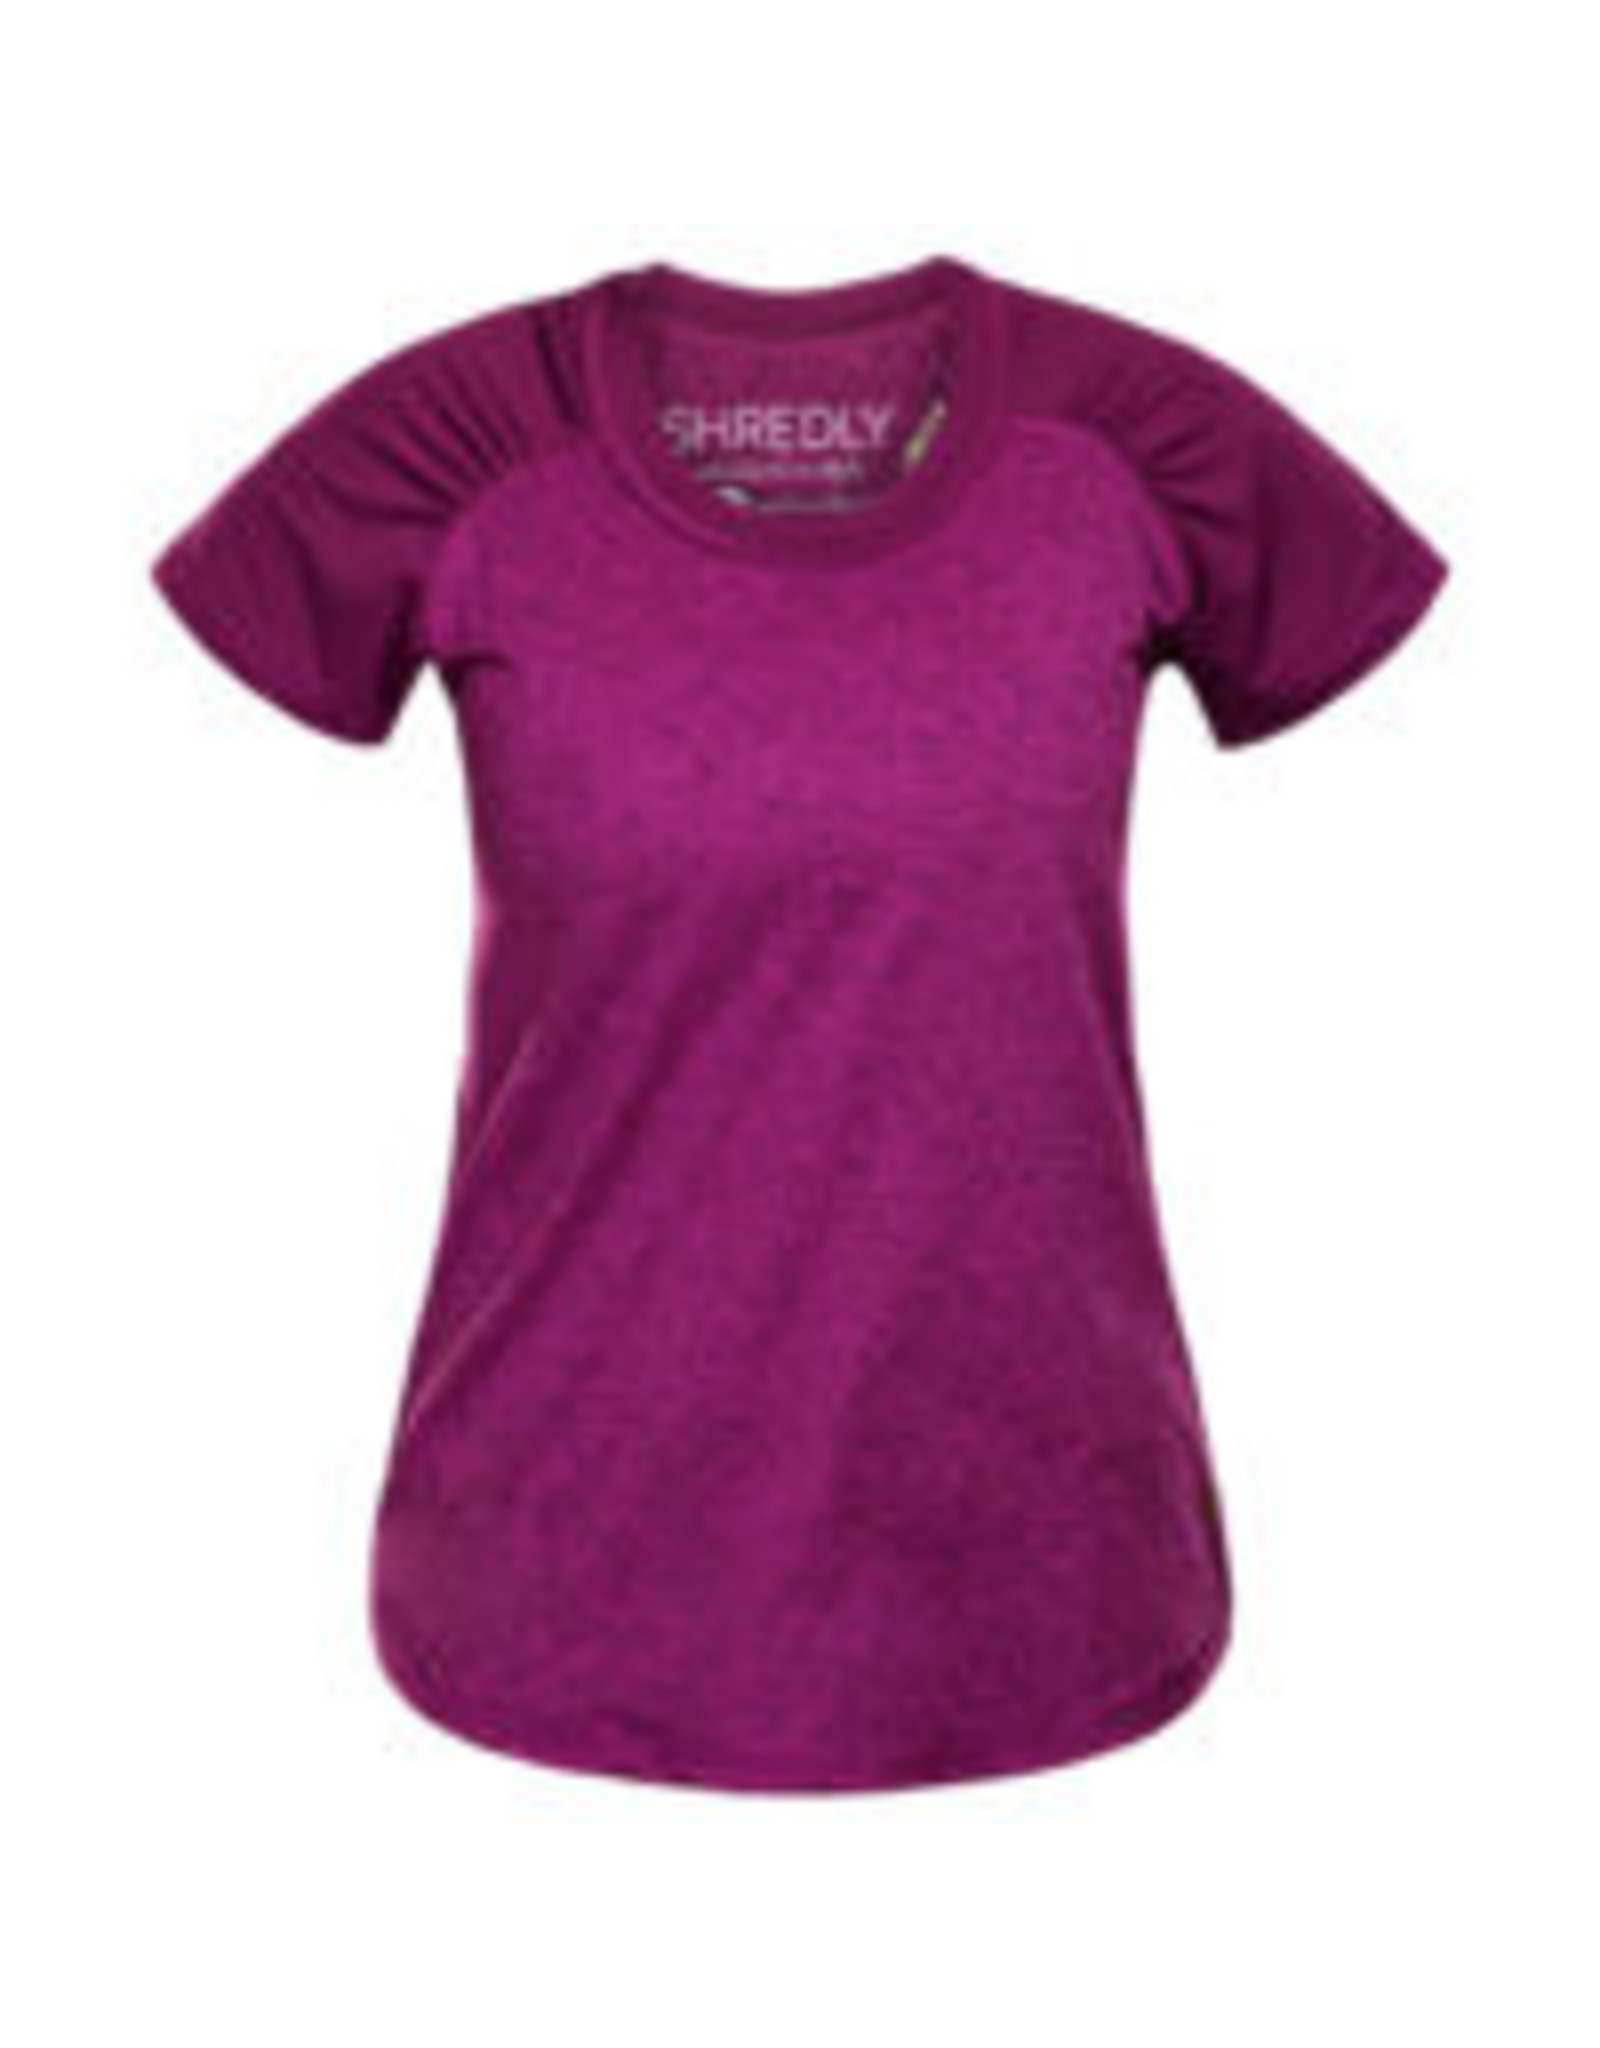 Shredly Shredly - the HONEYCOMB SHORT SLEEVE - Berry - Size L